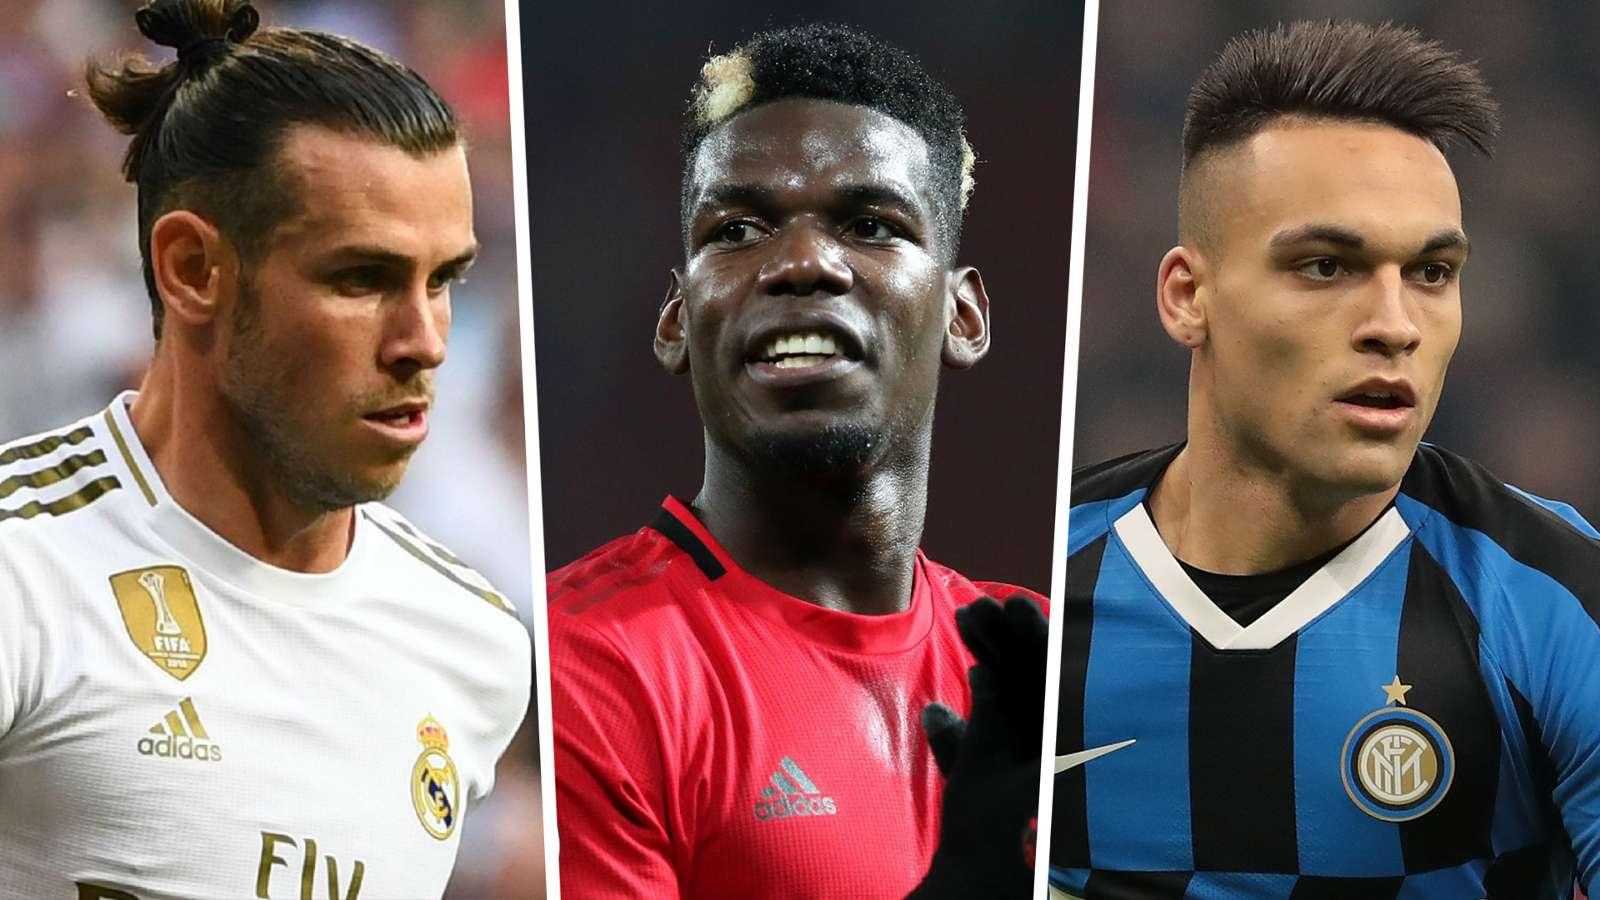 Gareth Bale Paul Pogba Lautaro Martinez 2019-20